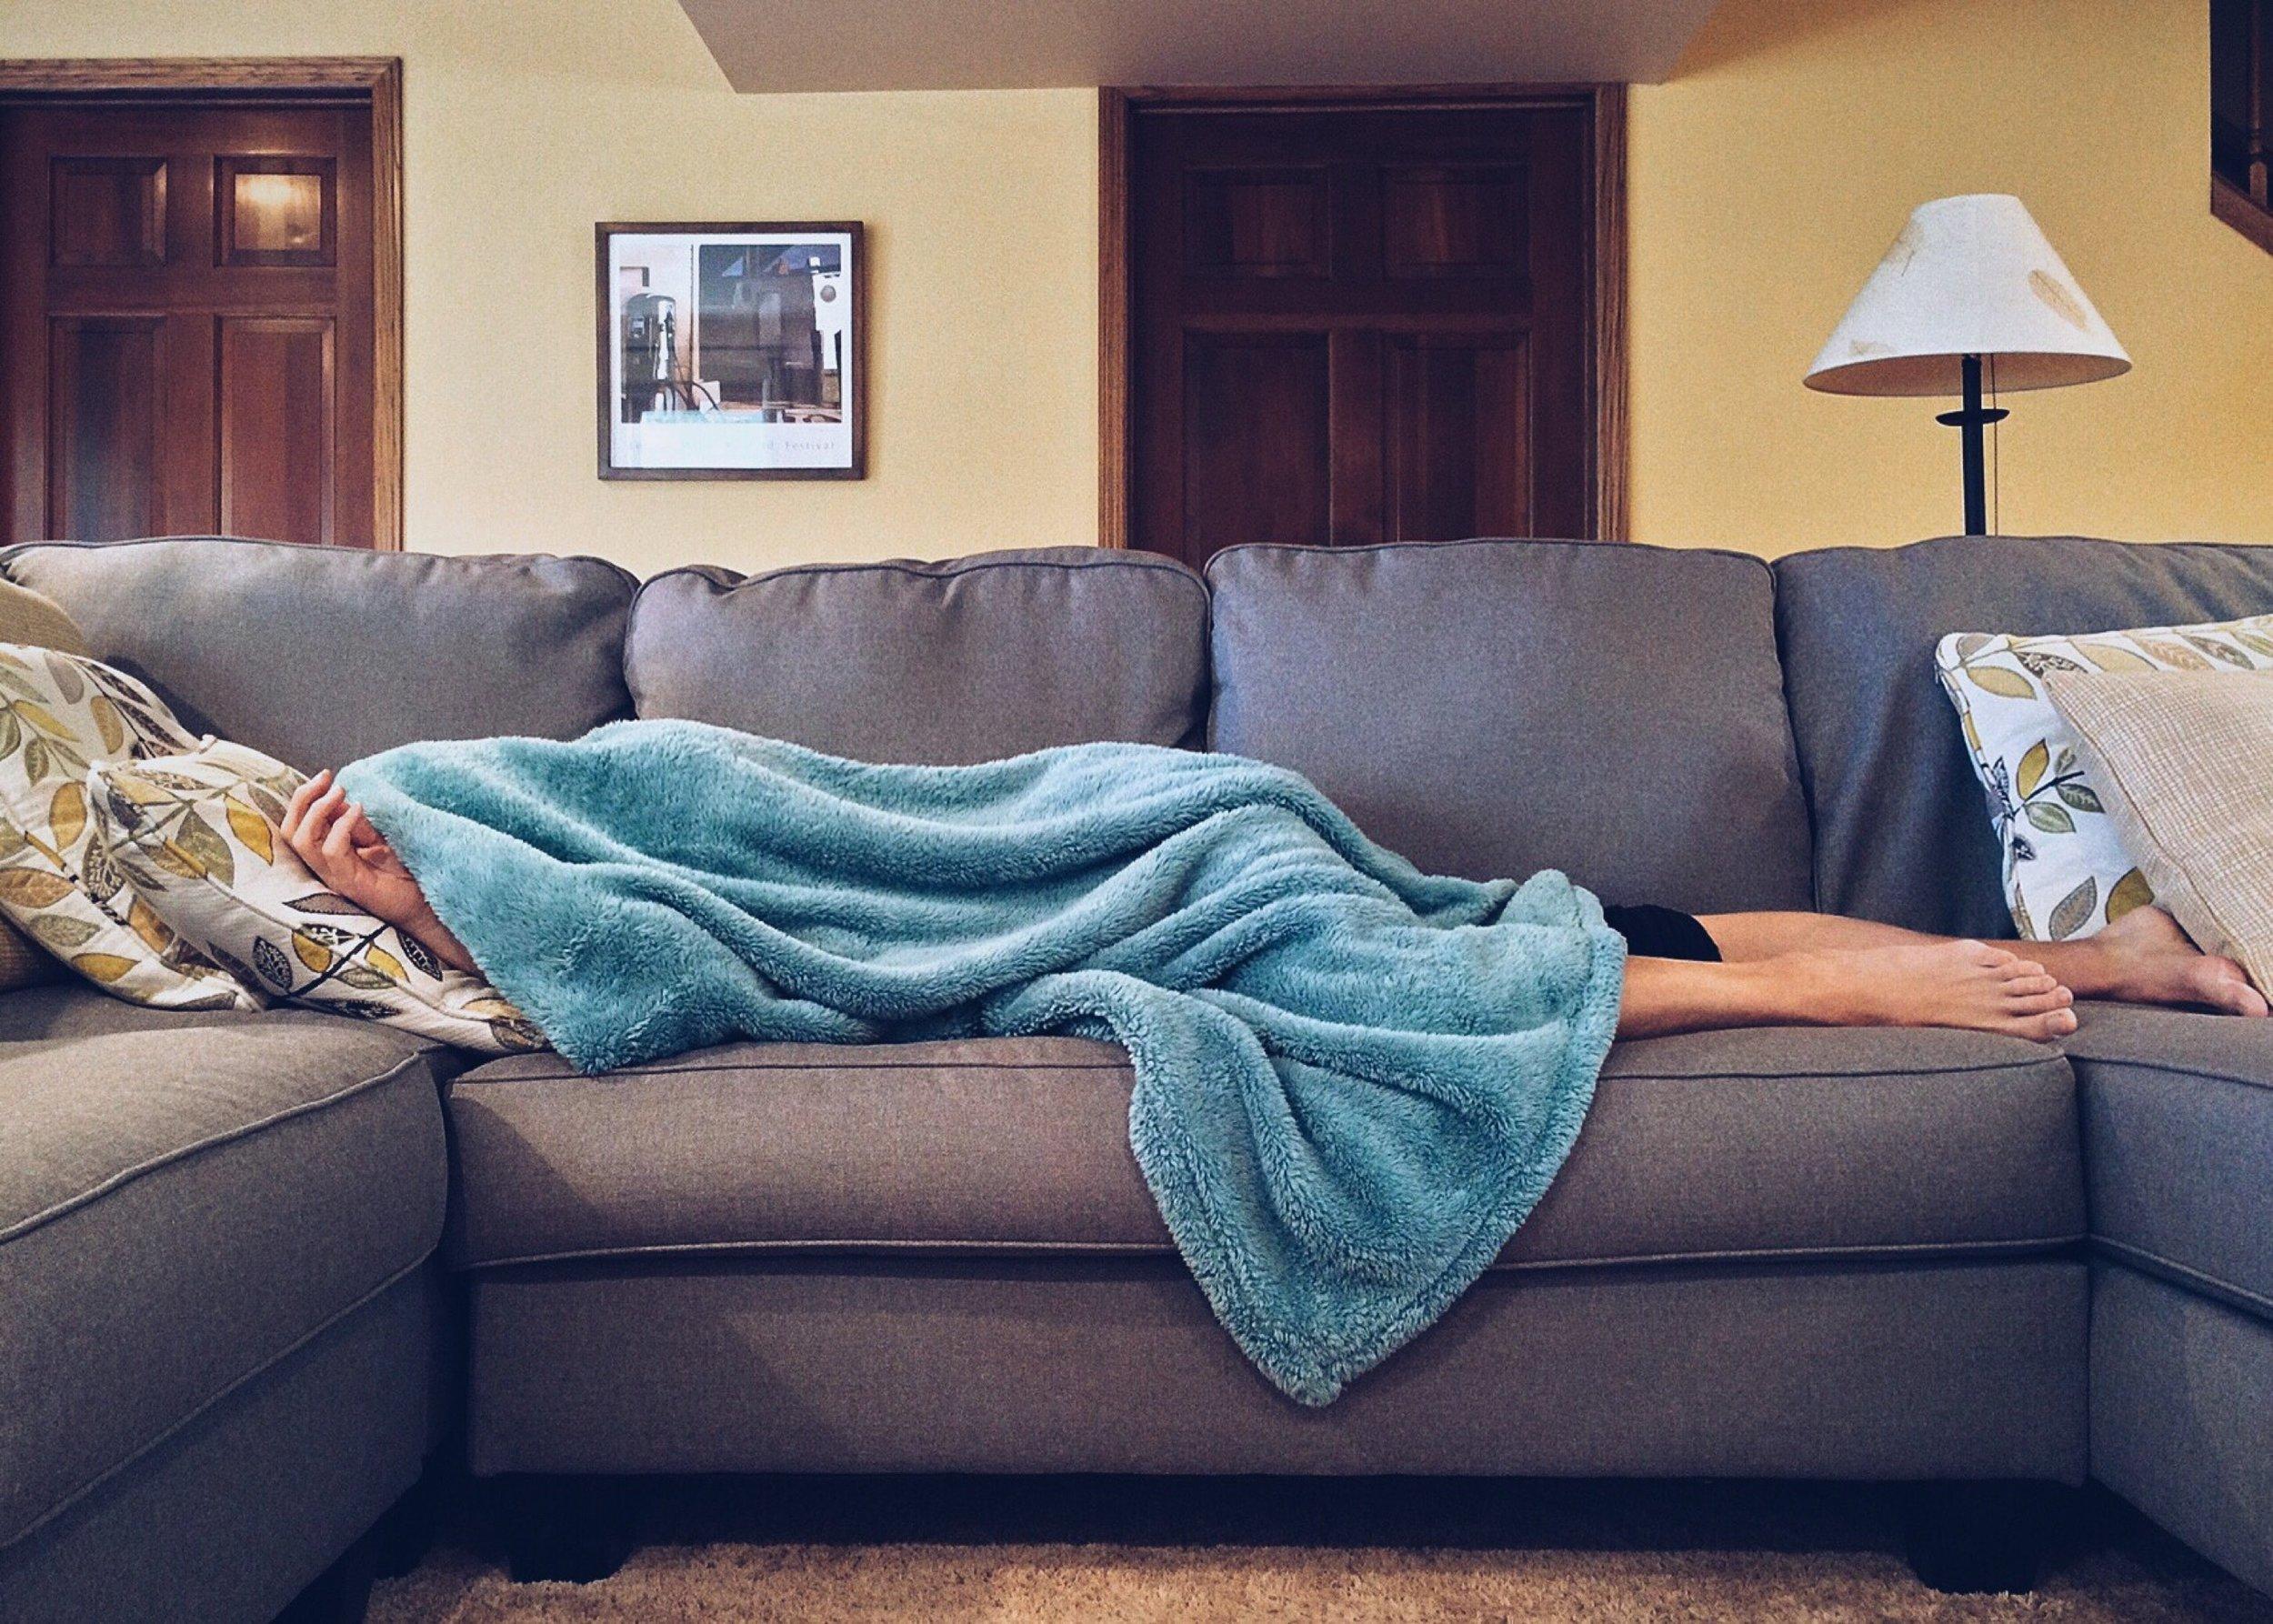 uwm.rightsidesleep.apartment-bed-carpet-269141.jpg